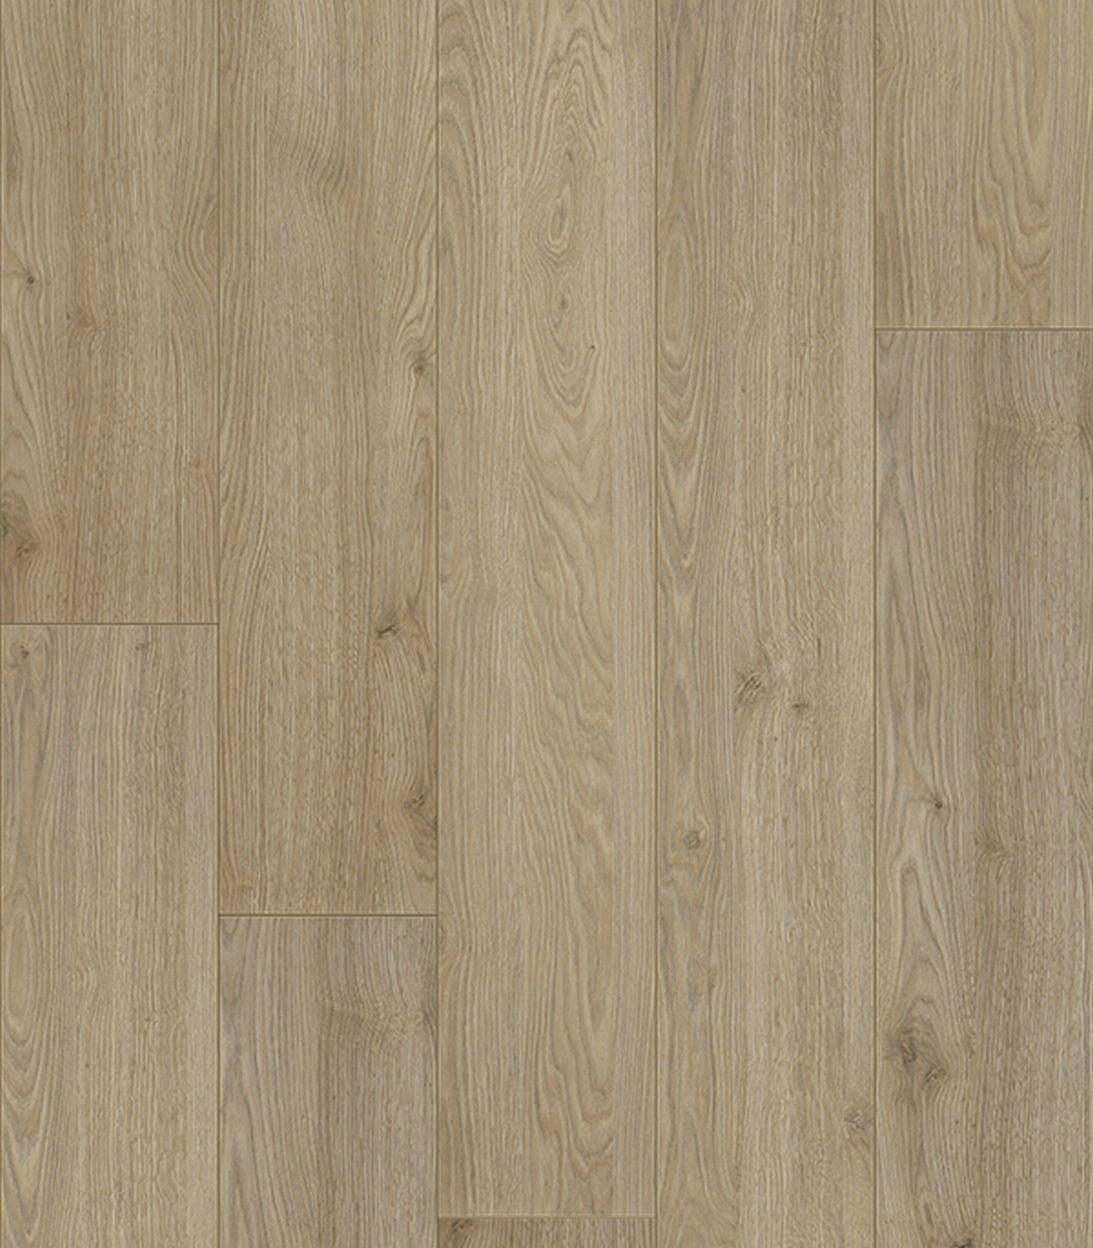 Ламинат 33 кл с фаской Kastamonu Floorpan Black 48 дуб индийский песочный 8 мм ламинат kastamonu 32 класс floorpan red дуб каньон ренессанс 1 упаковка 2 131 м2